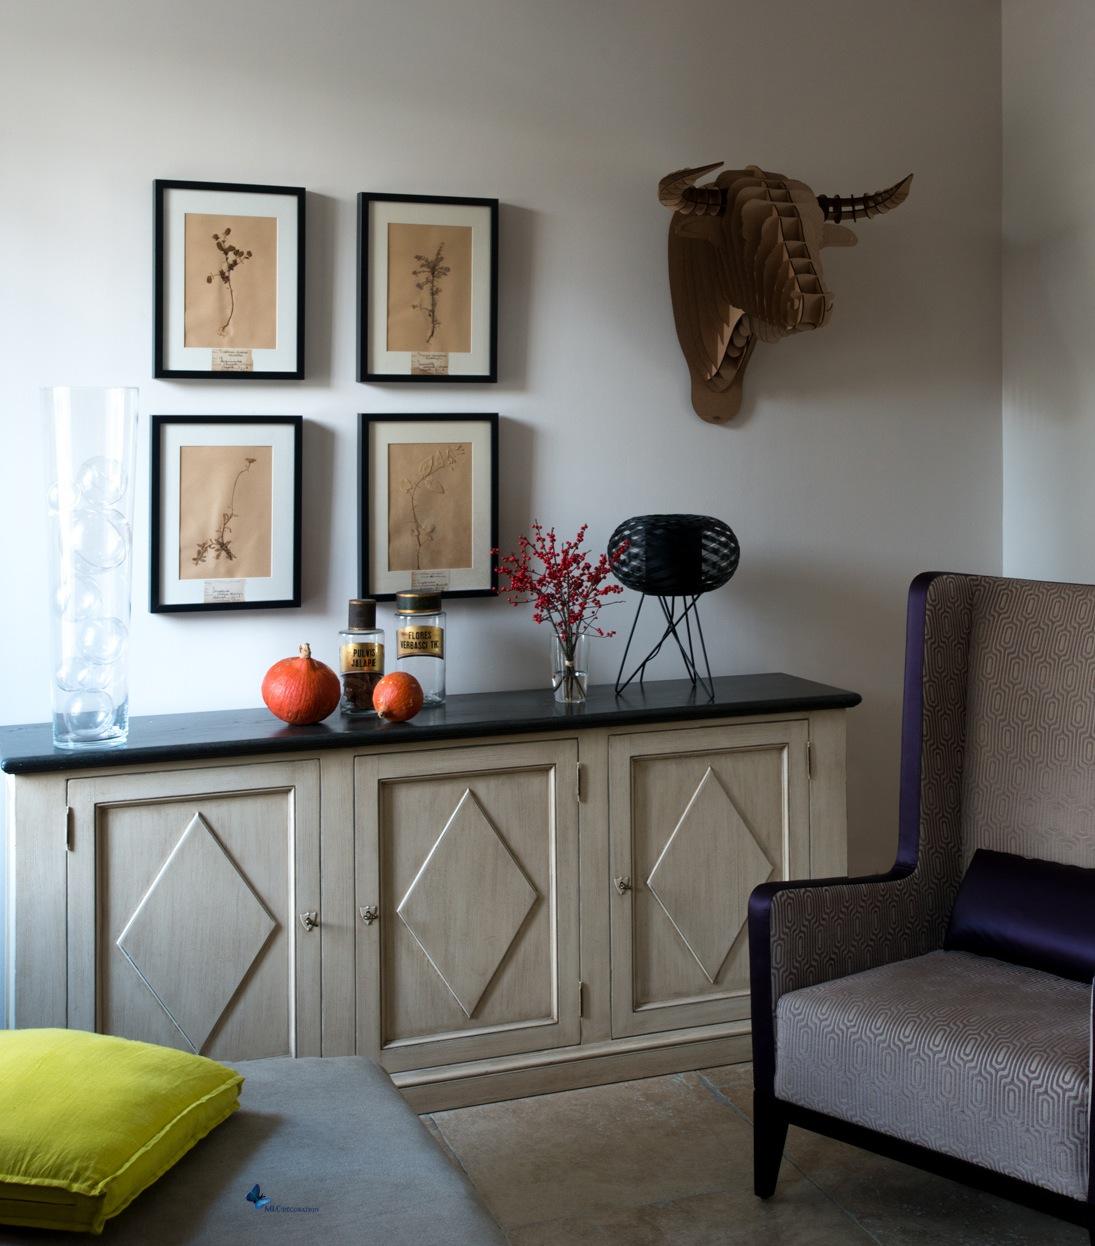 d co v g tale archives le blog d co de mlc. Black Bedroom Furniture Sets. Home Design Ideas